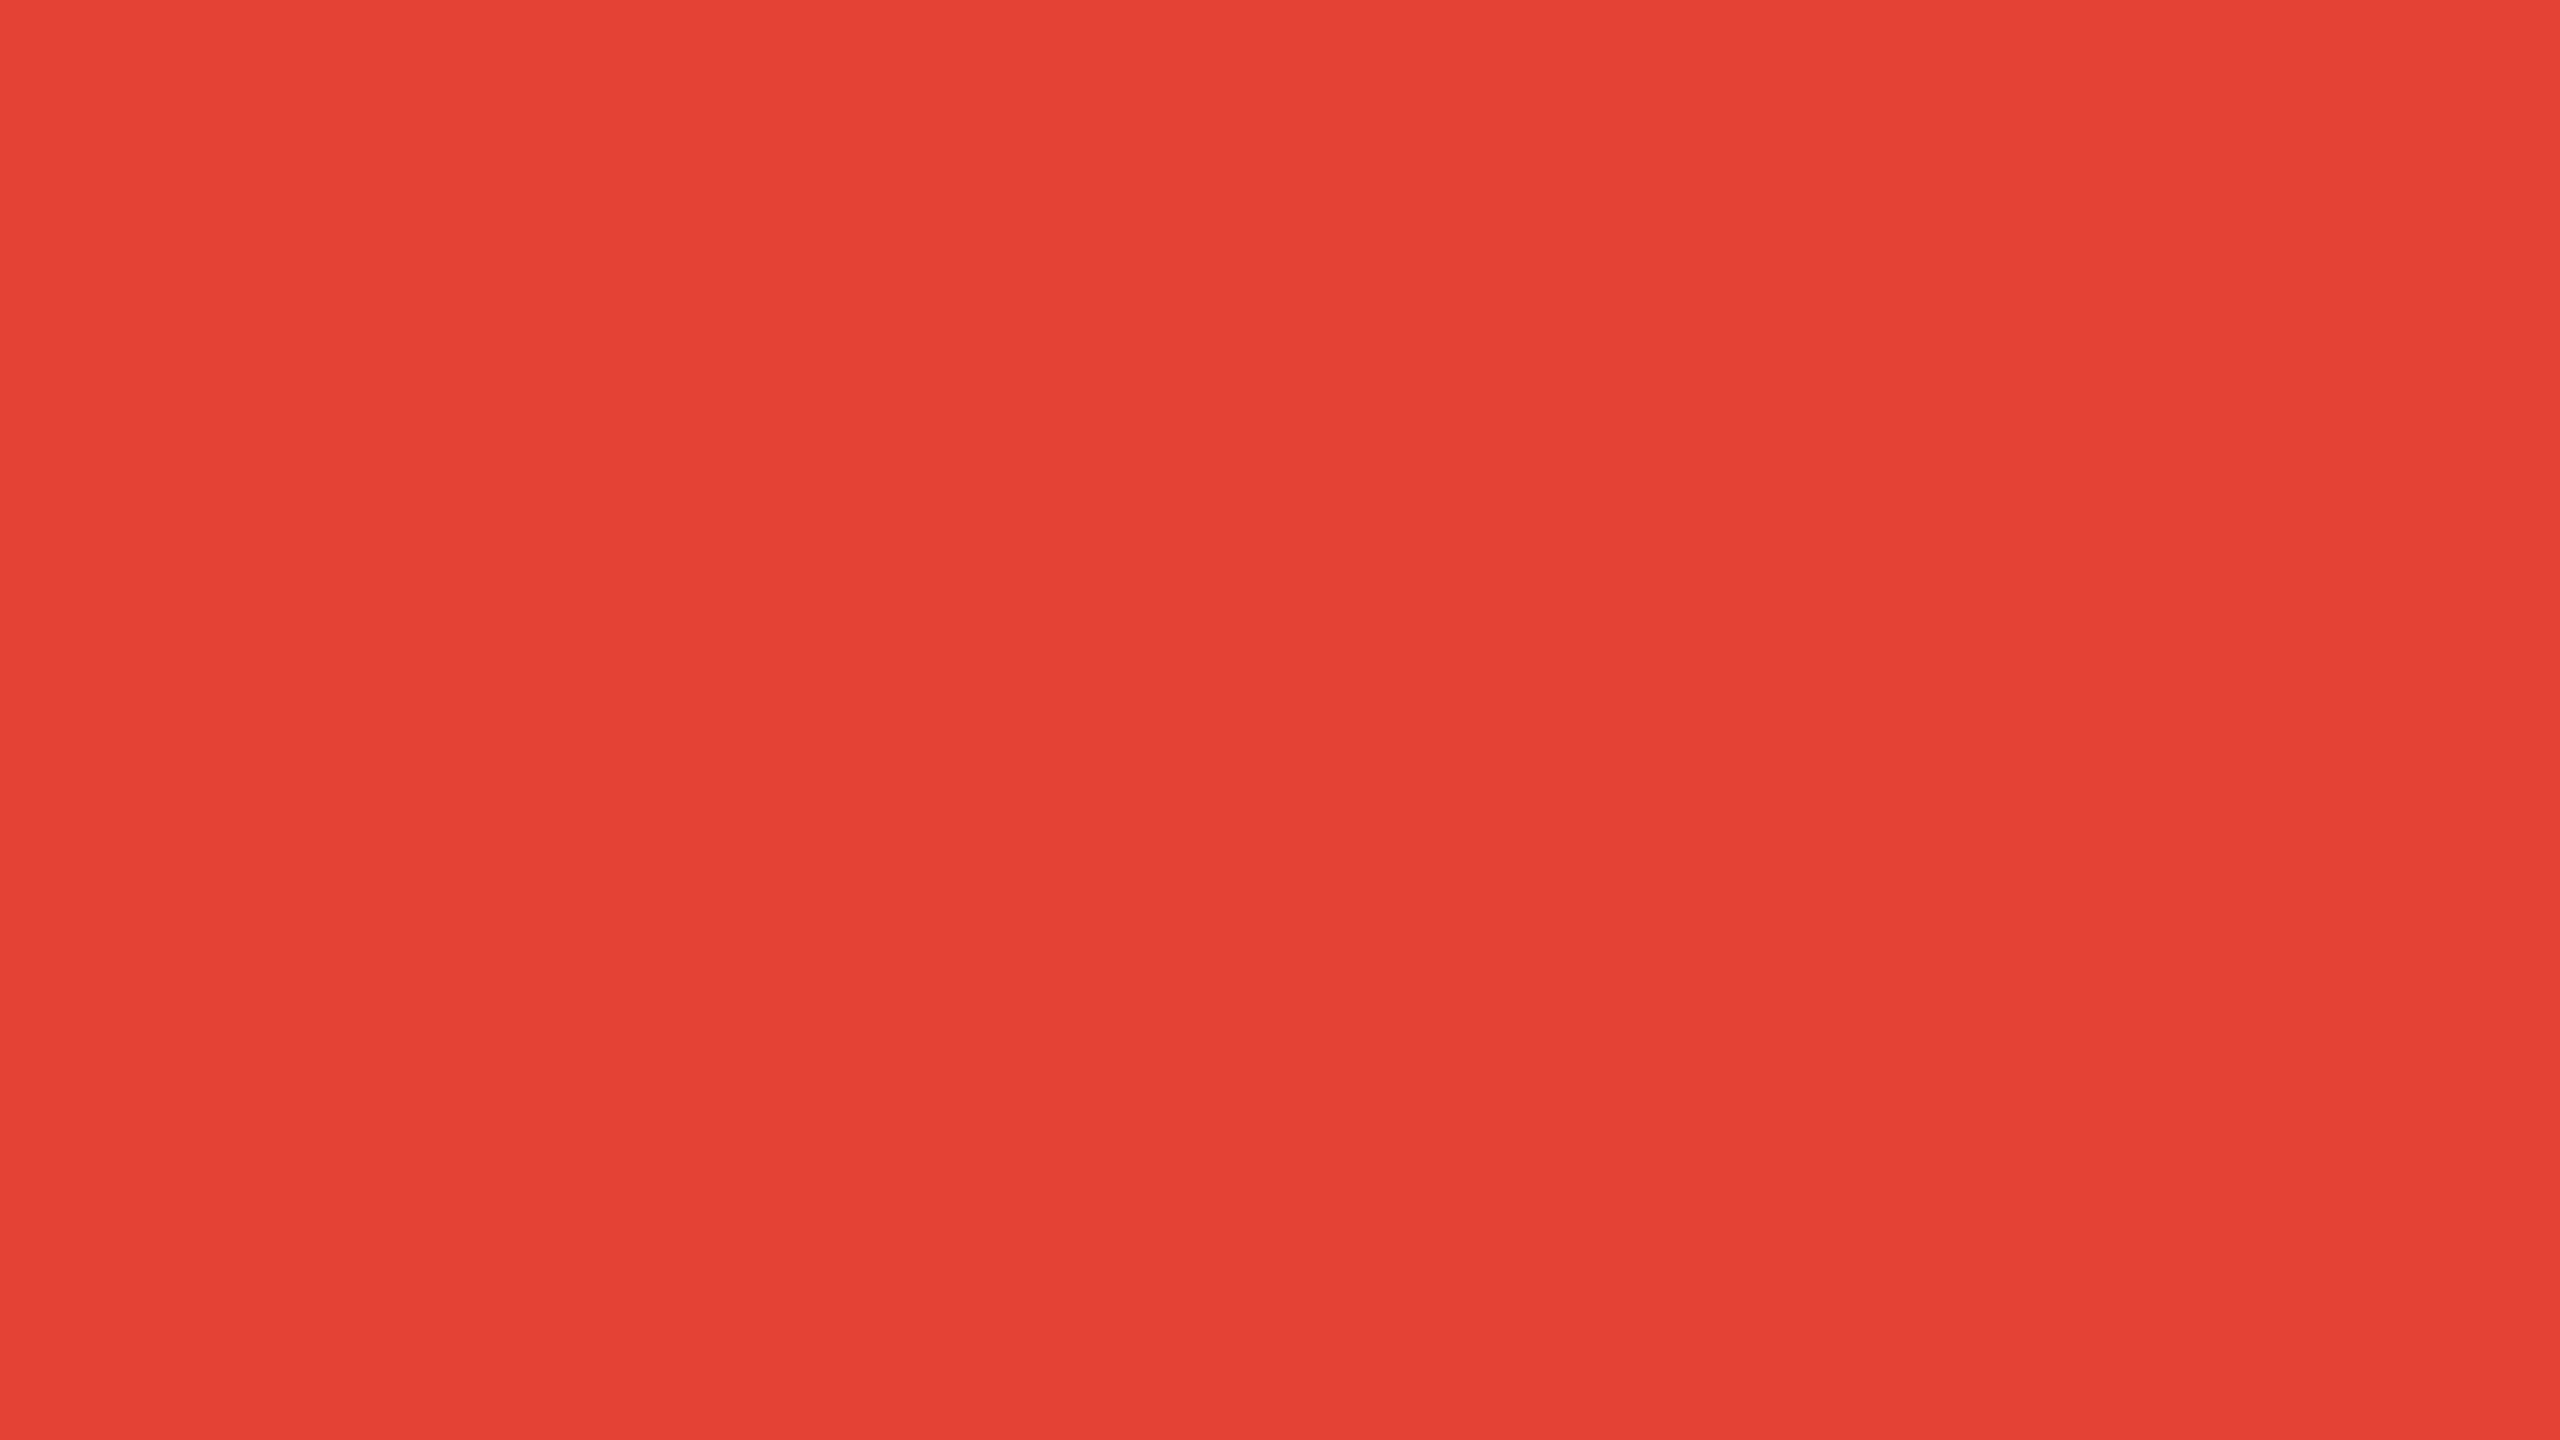 2560x1440 Vermilion Cinnabar Solid Color Background